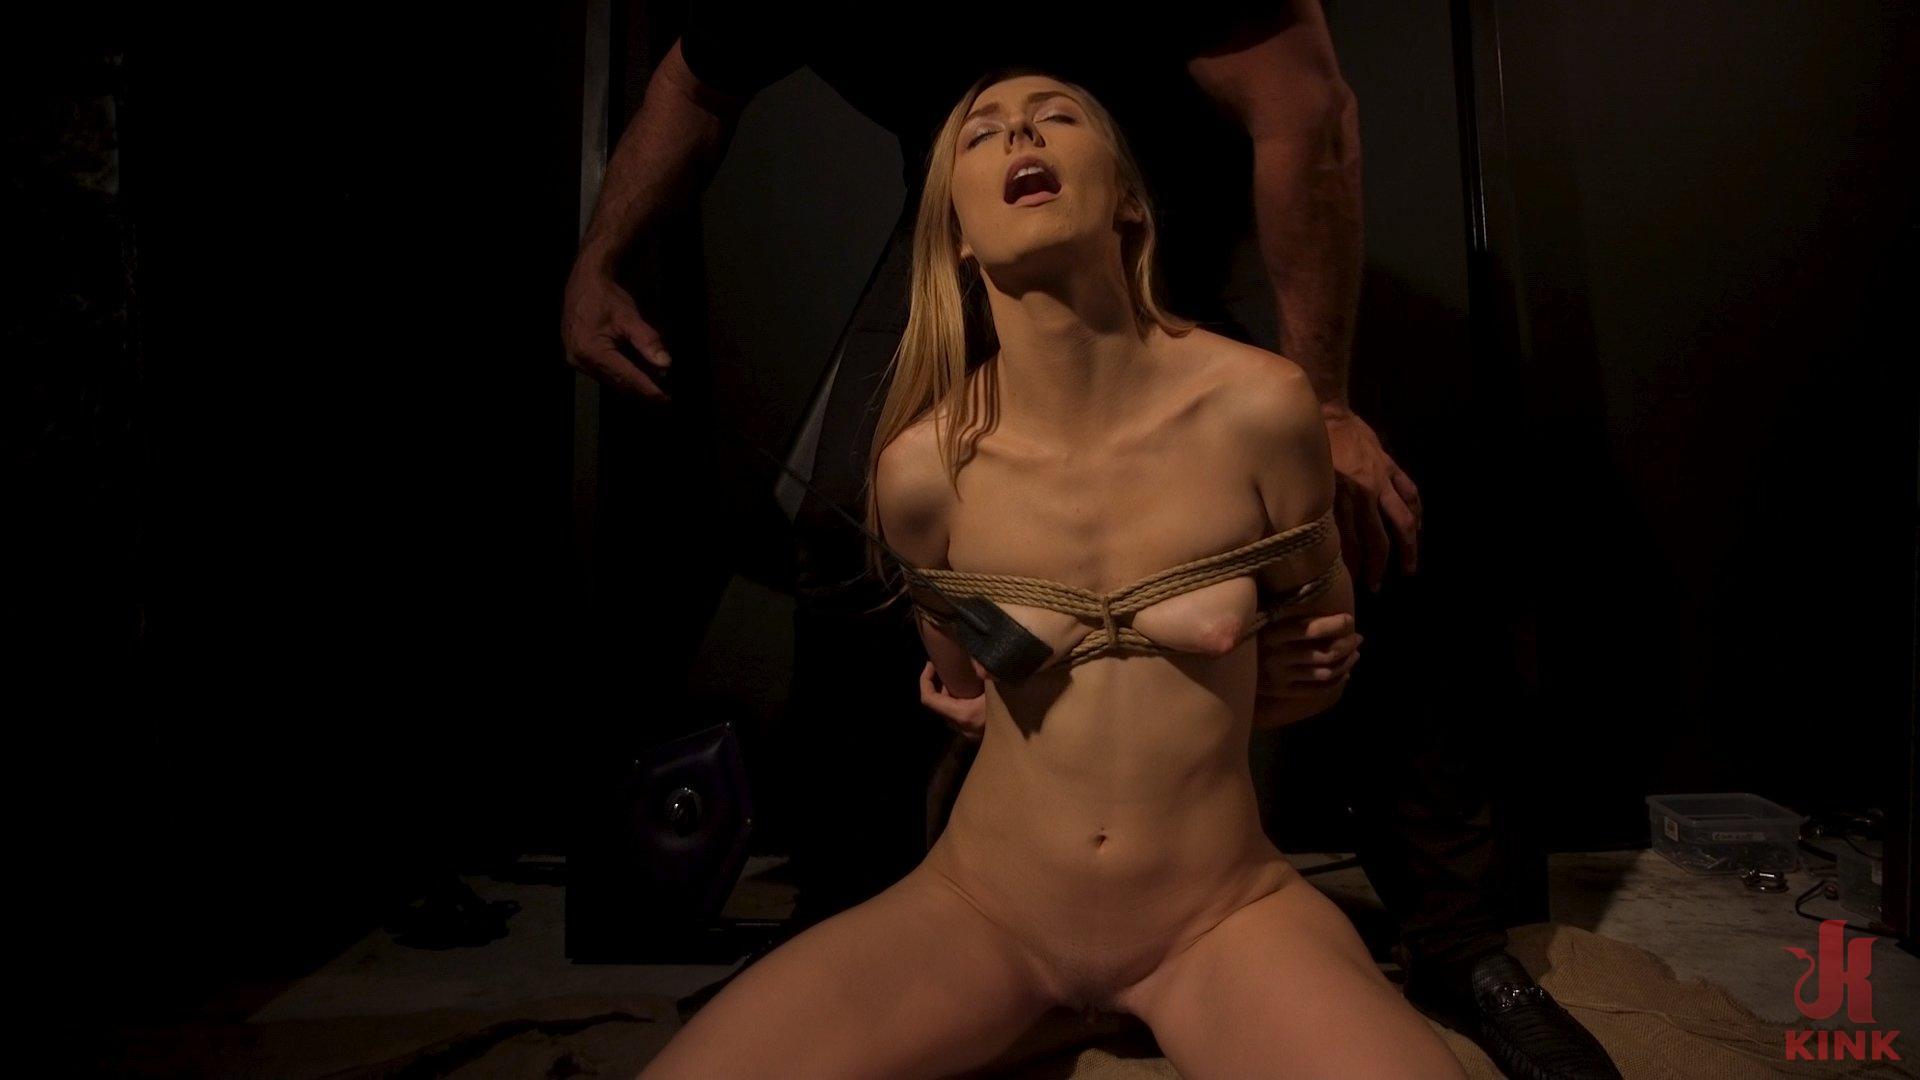 Photo number 7 from Skinny Blonde Slut Alexa Grace in Sadistic Rope Bondage Pussy Fucking! shot for Brutal Sessions on Kink.com. Featuring Ramon Nomar and Alexa Grace in hardcore BDSM & Fetish porn.